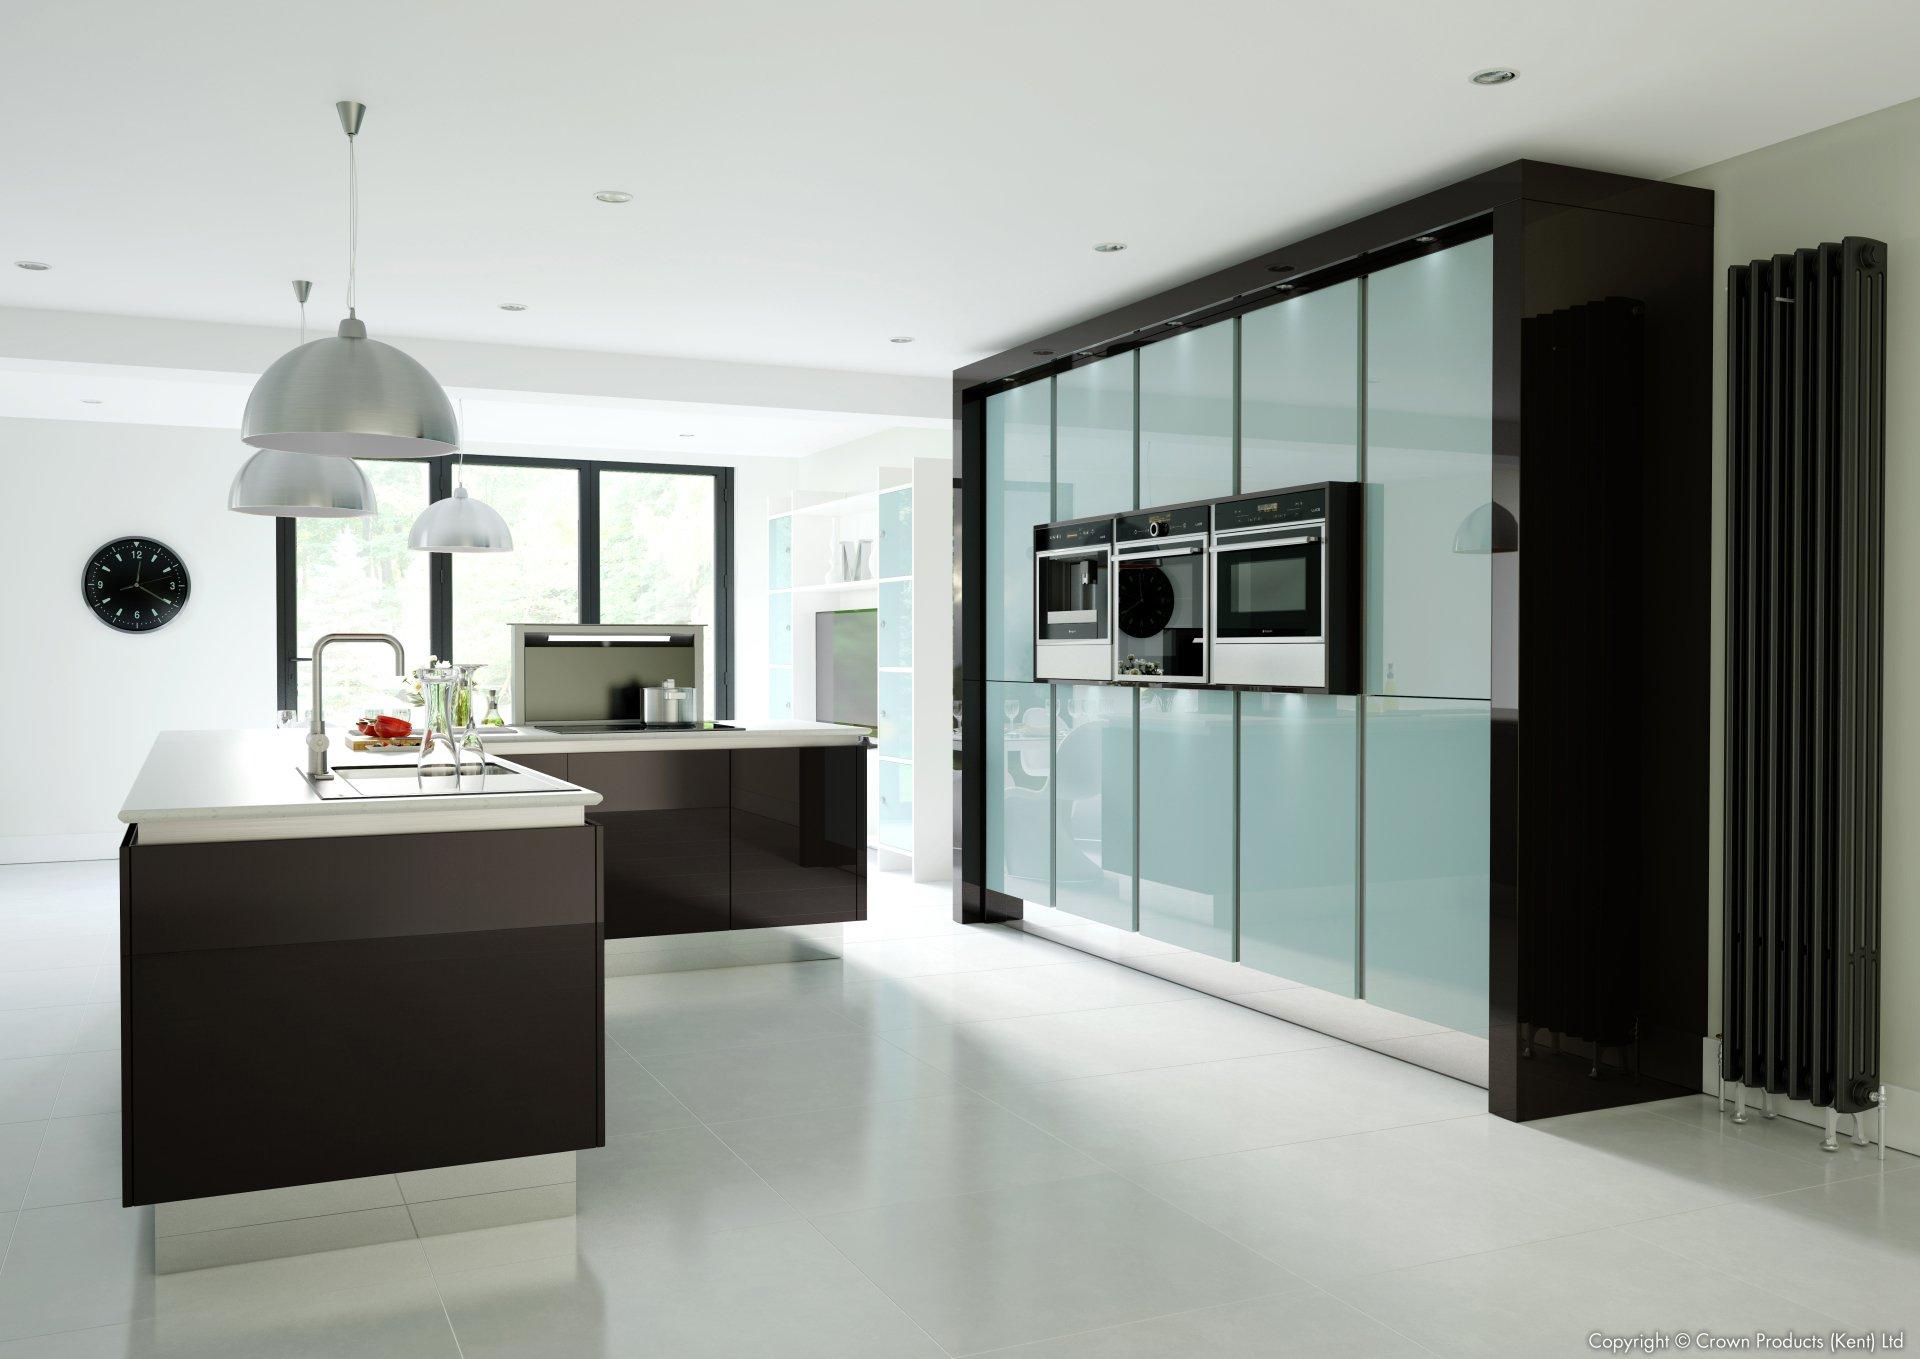 Choose our team in Rainham for kitchen ideas